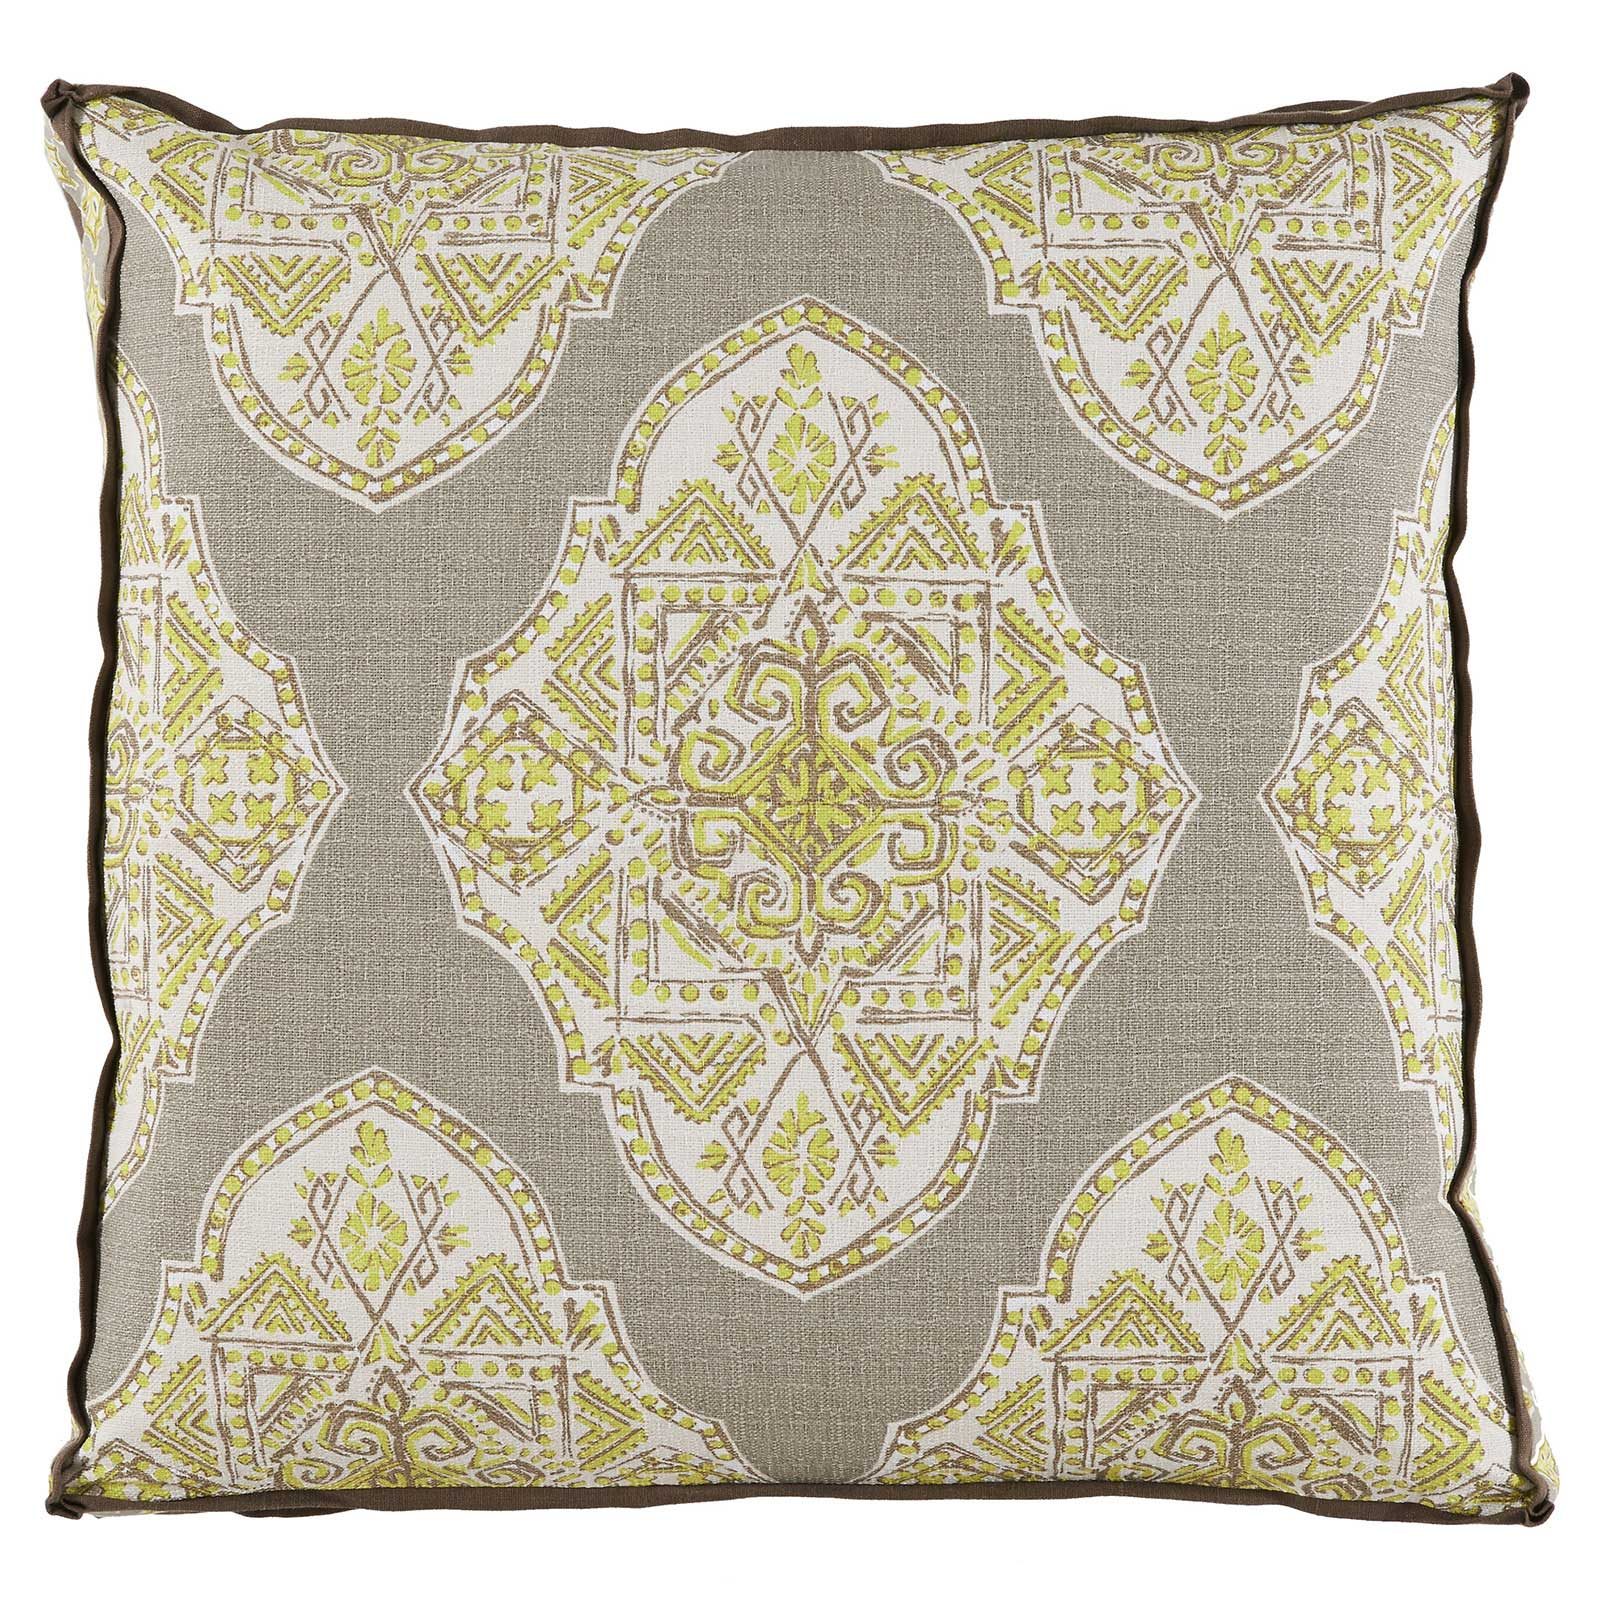 Biza Global Bazaar Medallion Citrus Beige Pillow - 24x24